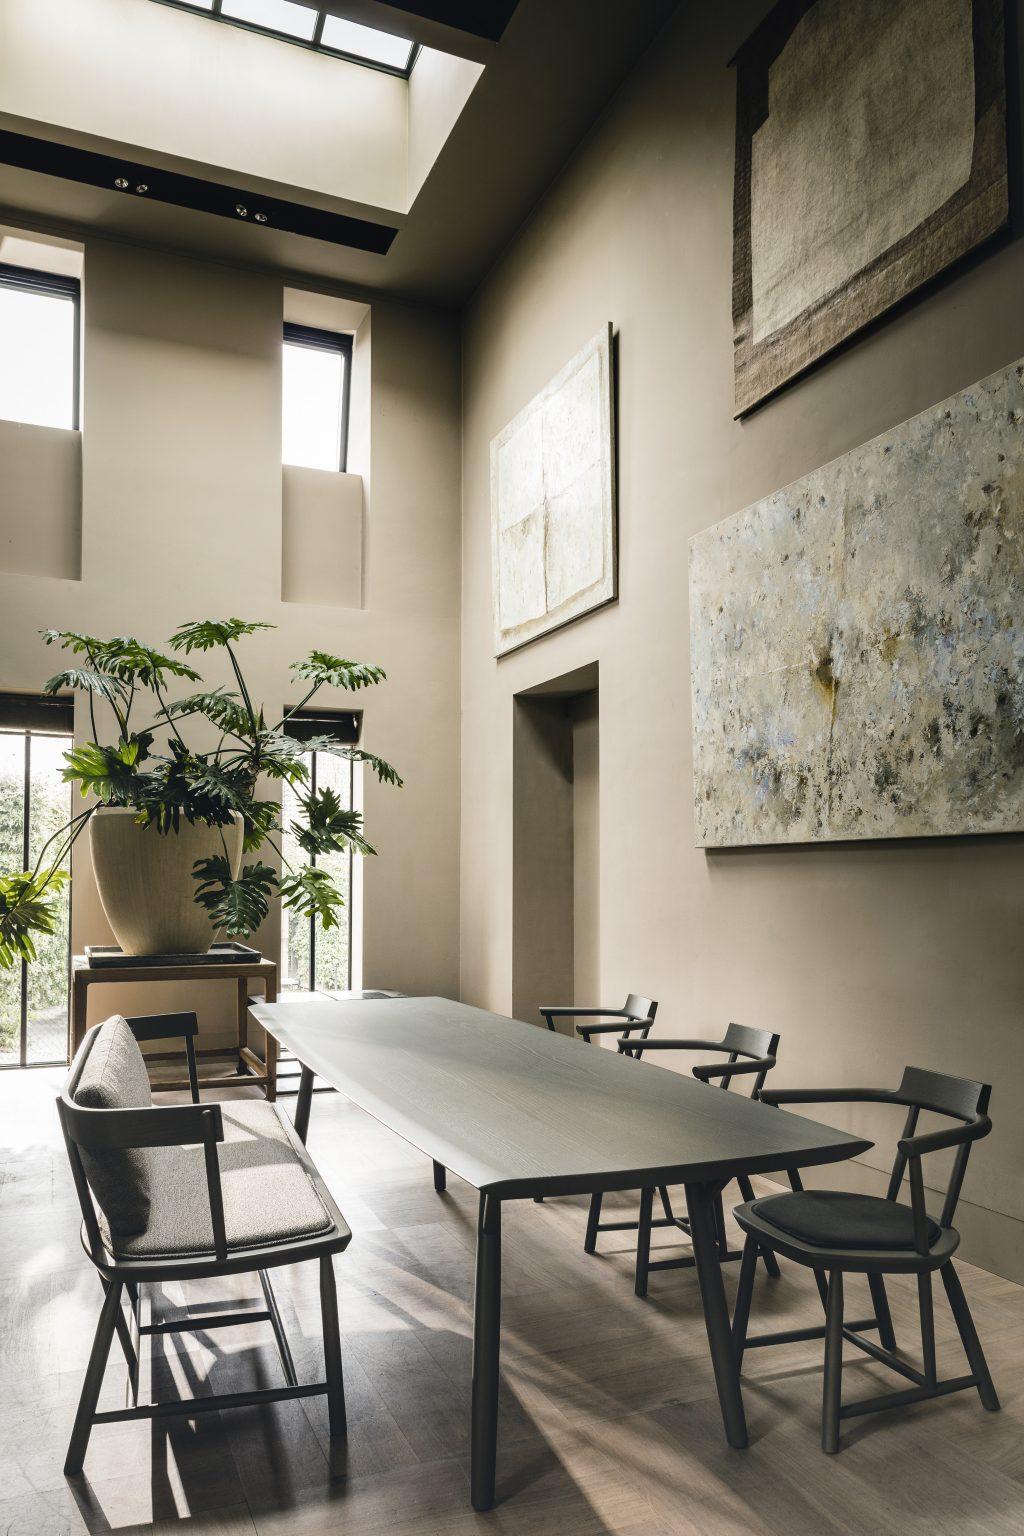 Biennale Interieur - Belgium's leading design and interior event - Linteloo-oiseau-s2.jpg